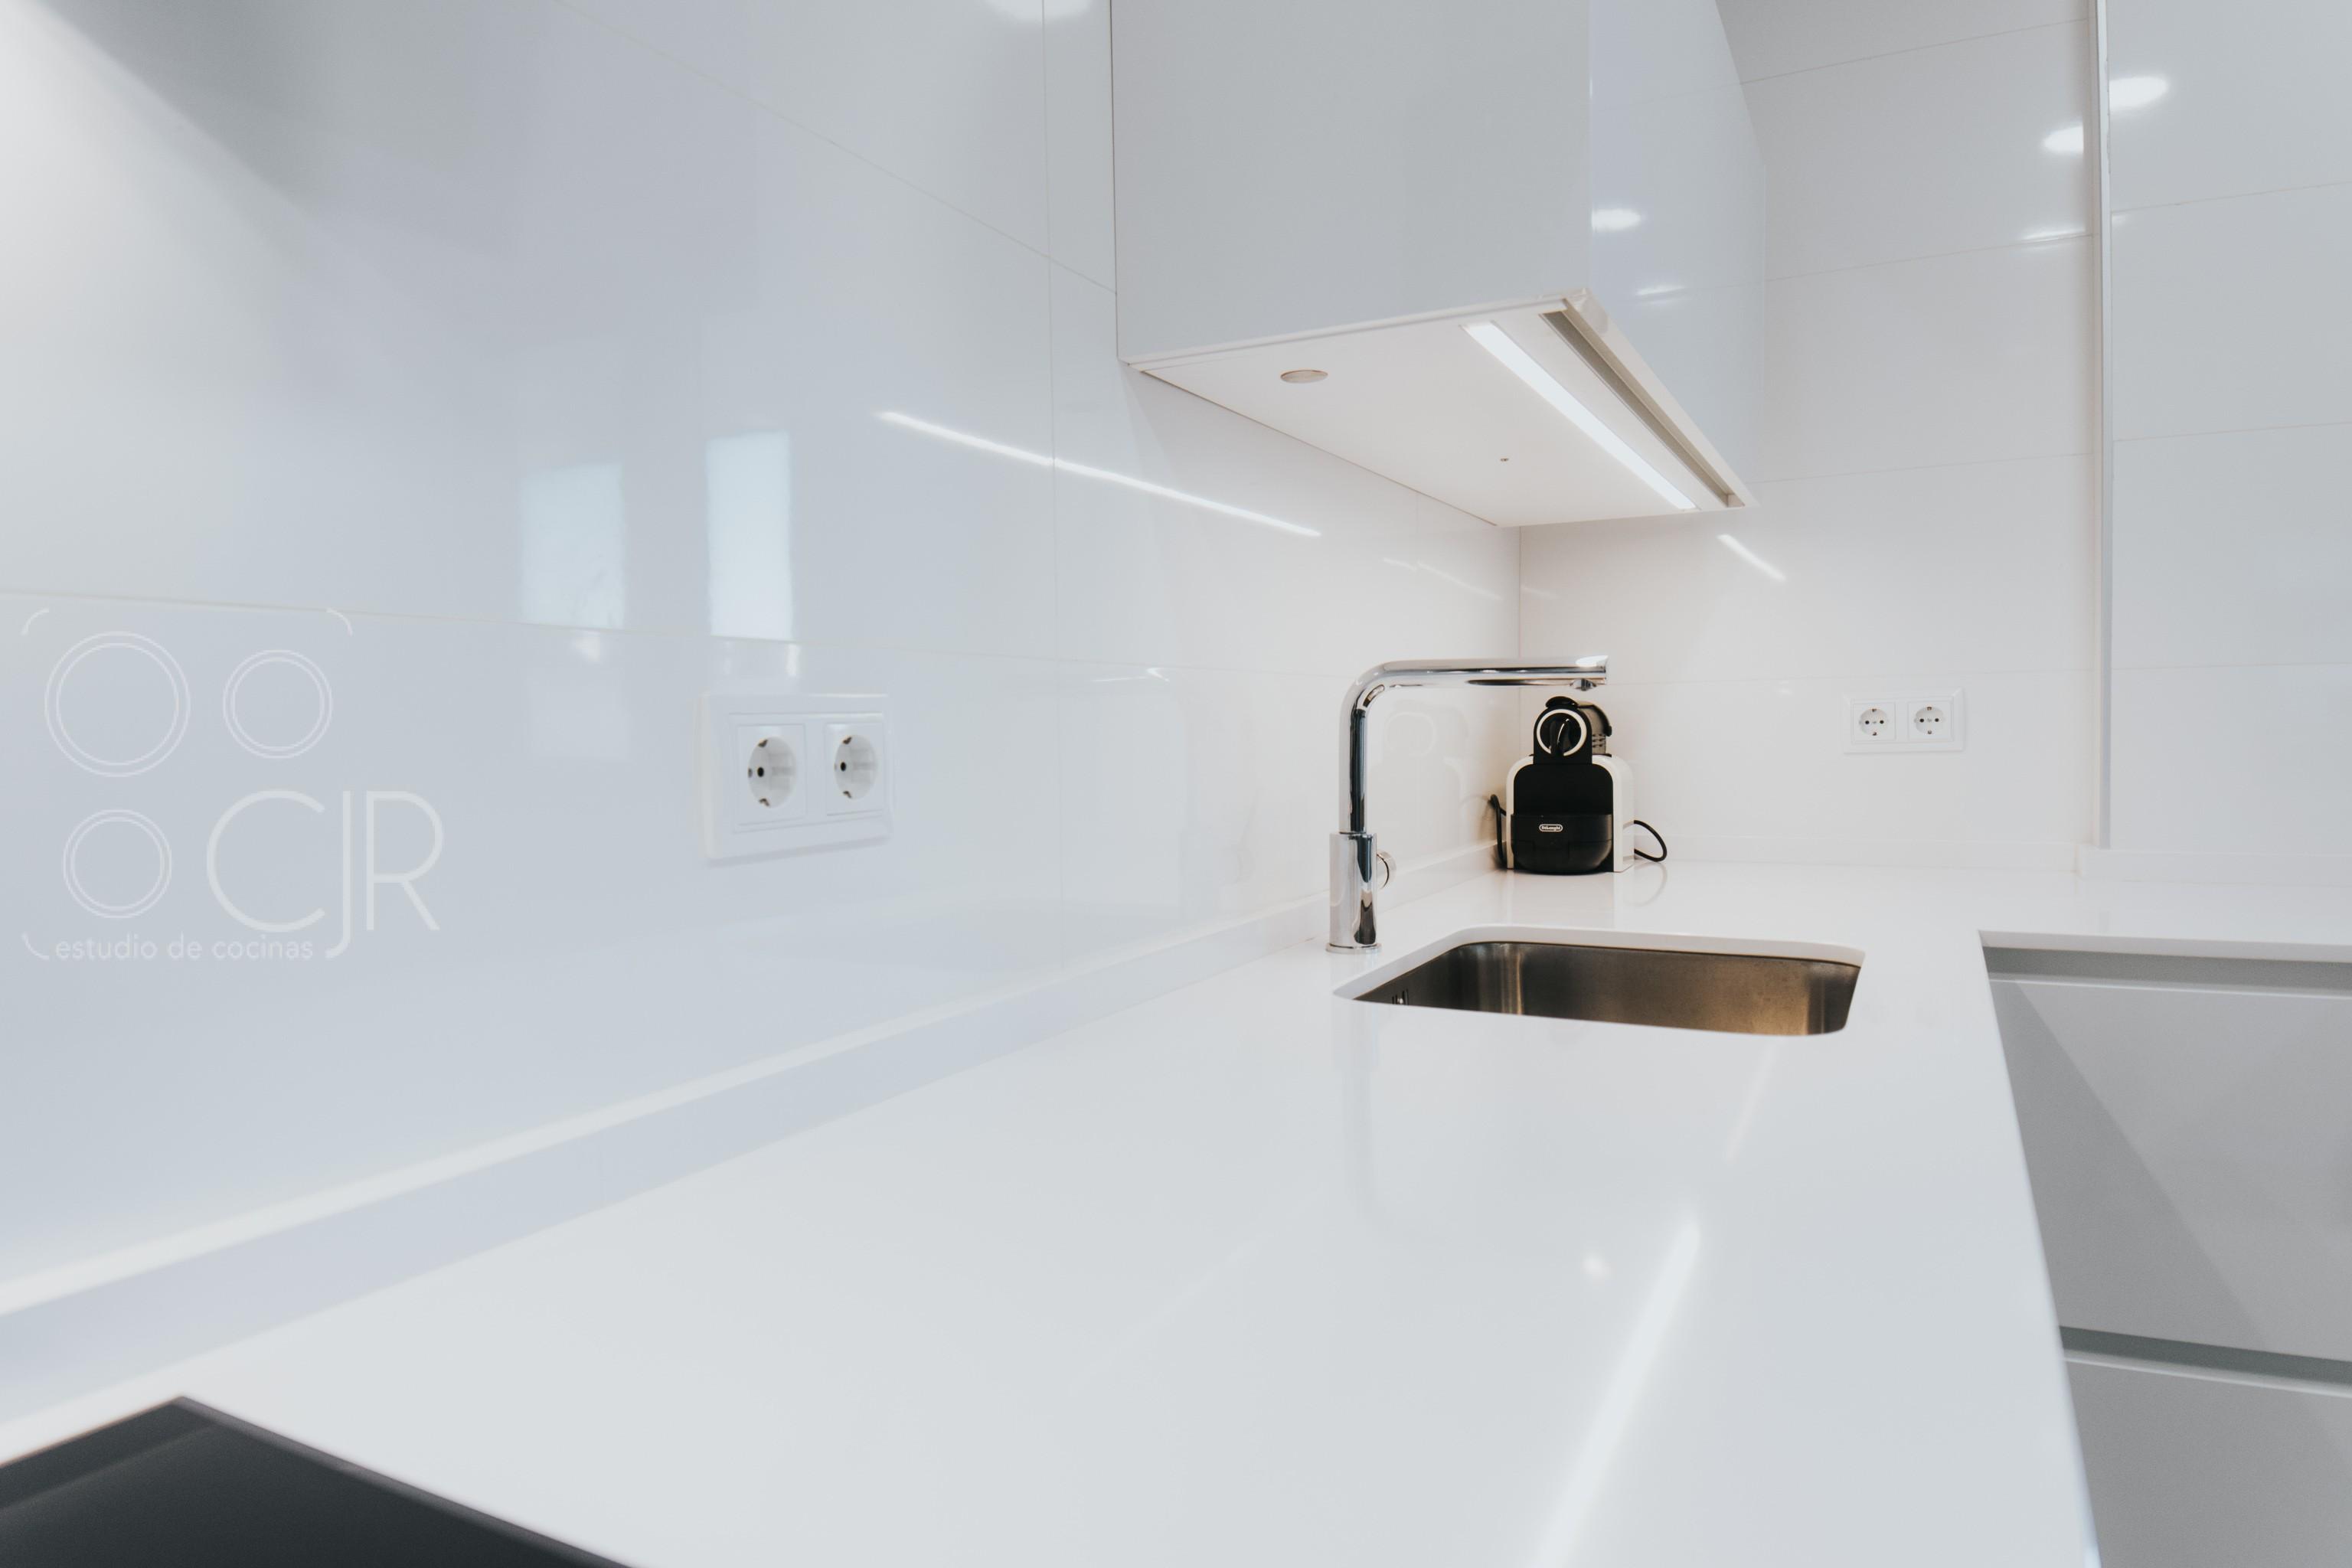 iluminicion led para cocina